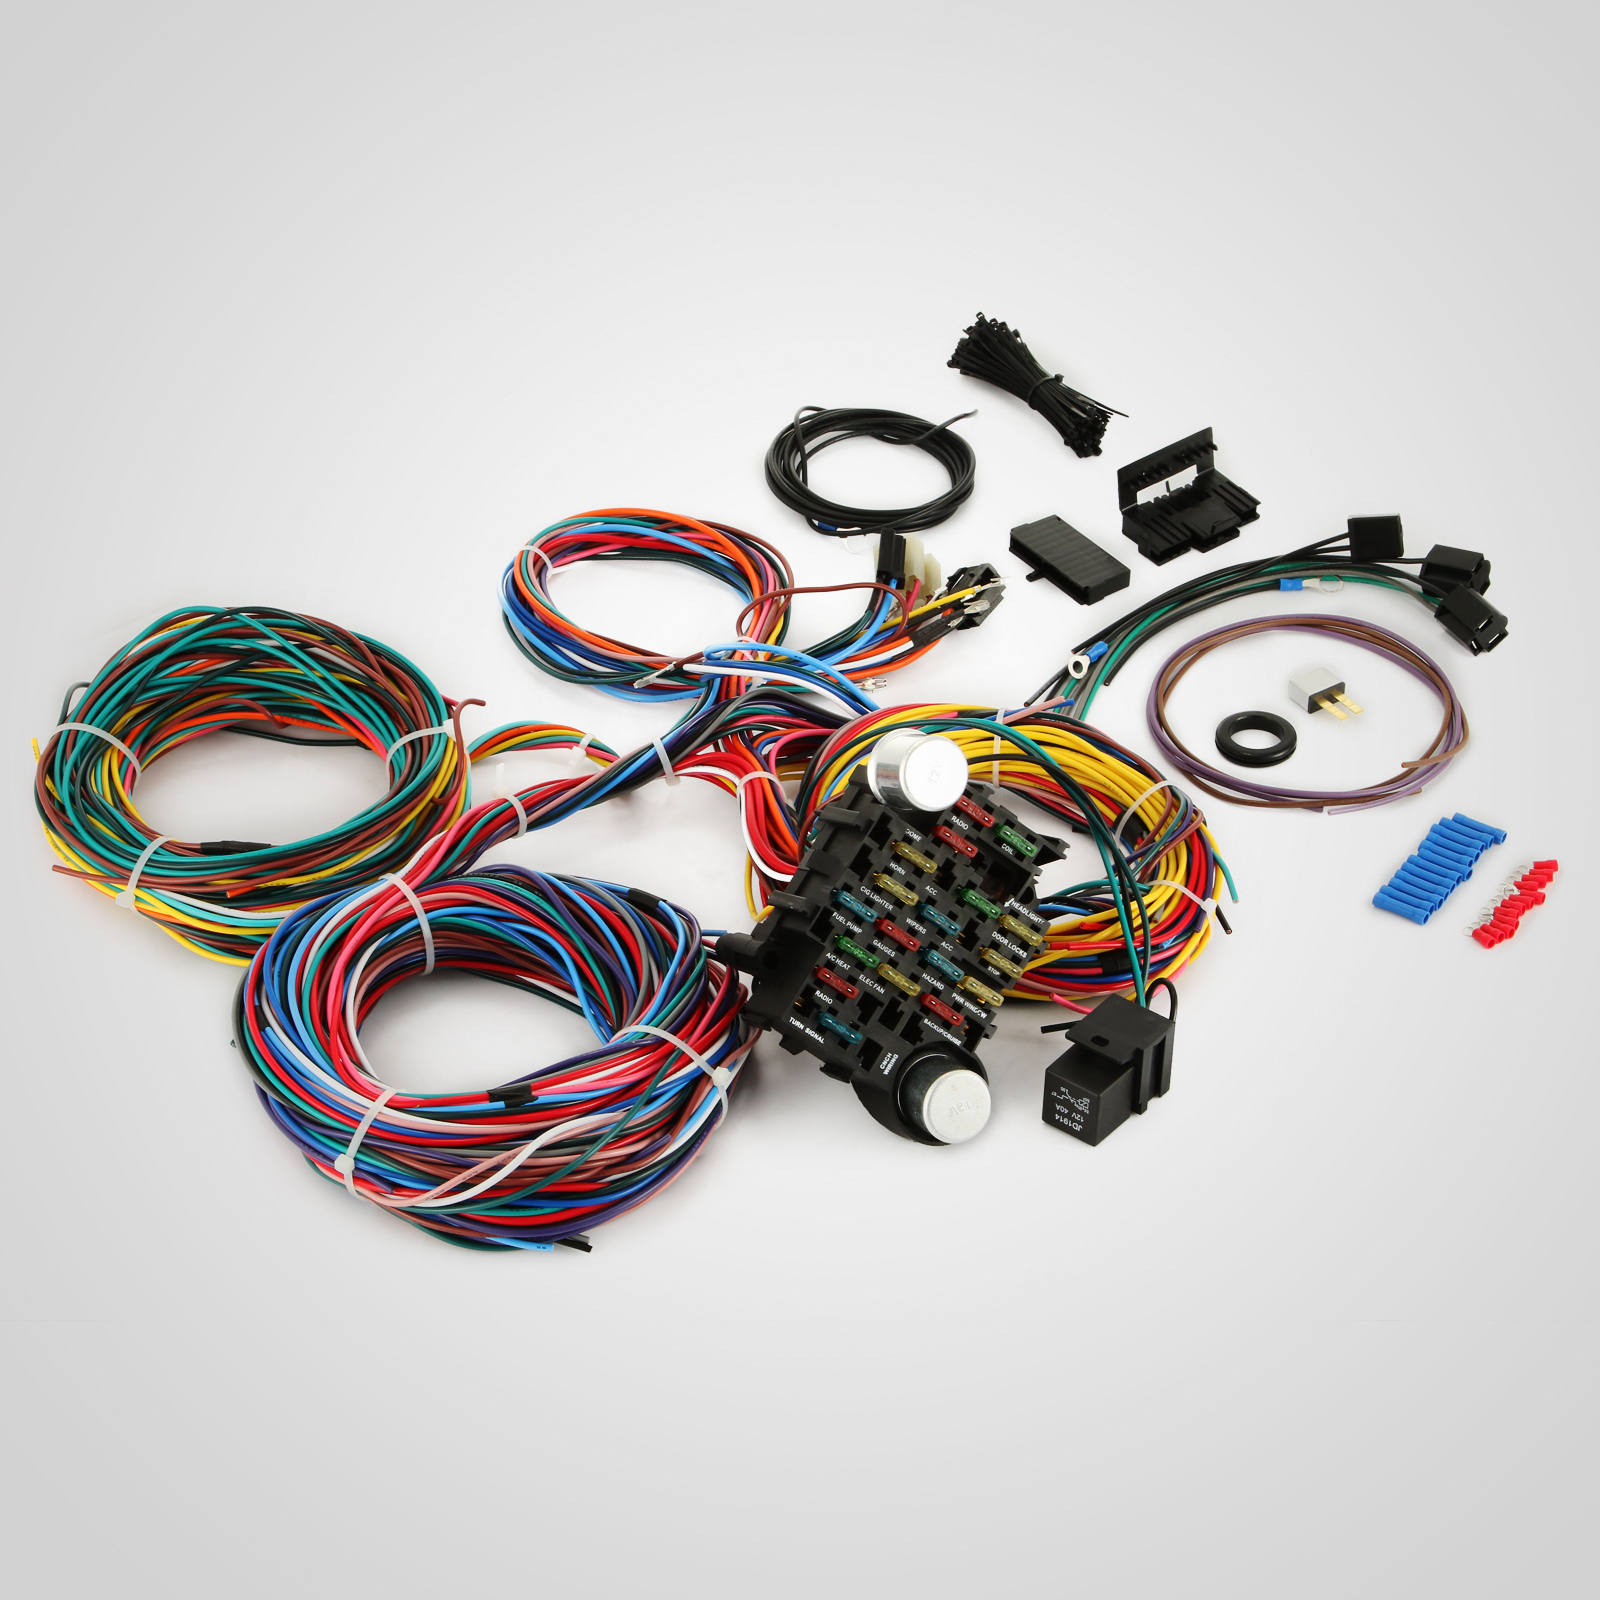 Apc Universal Wiring Harness : Circuit ez wiring harness chevy universal wires install